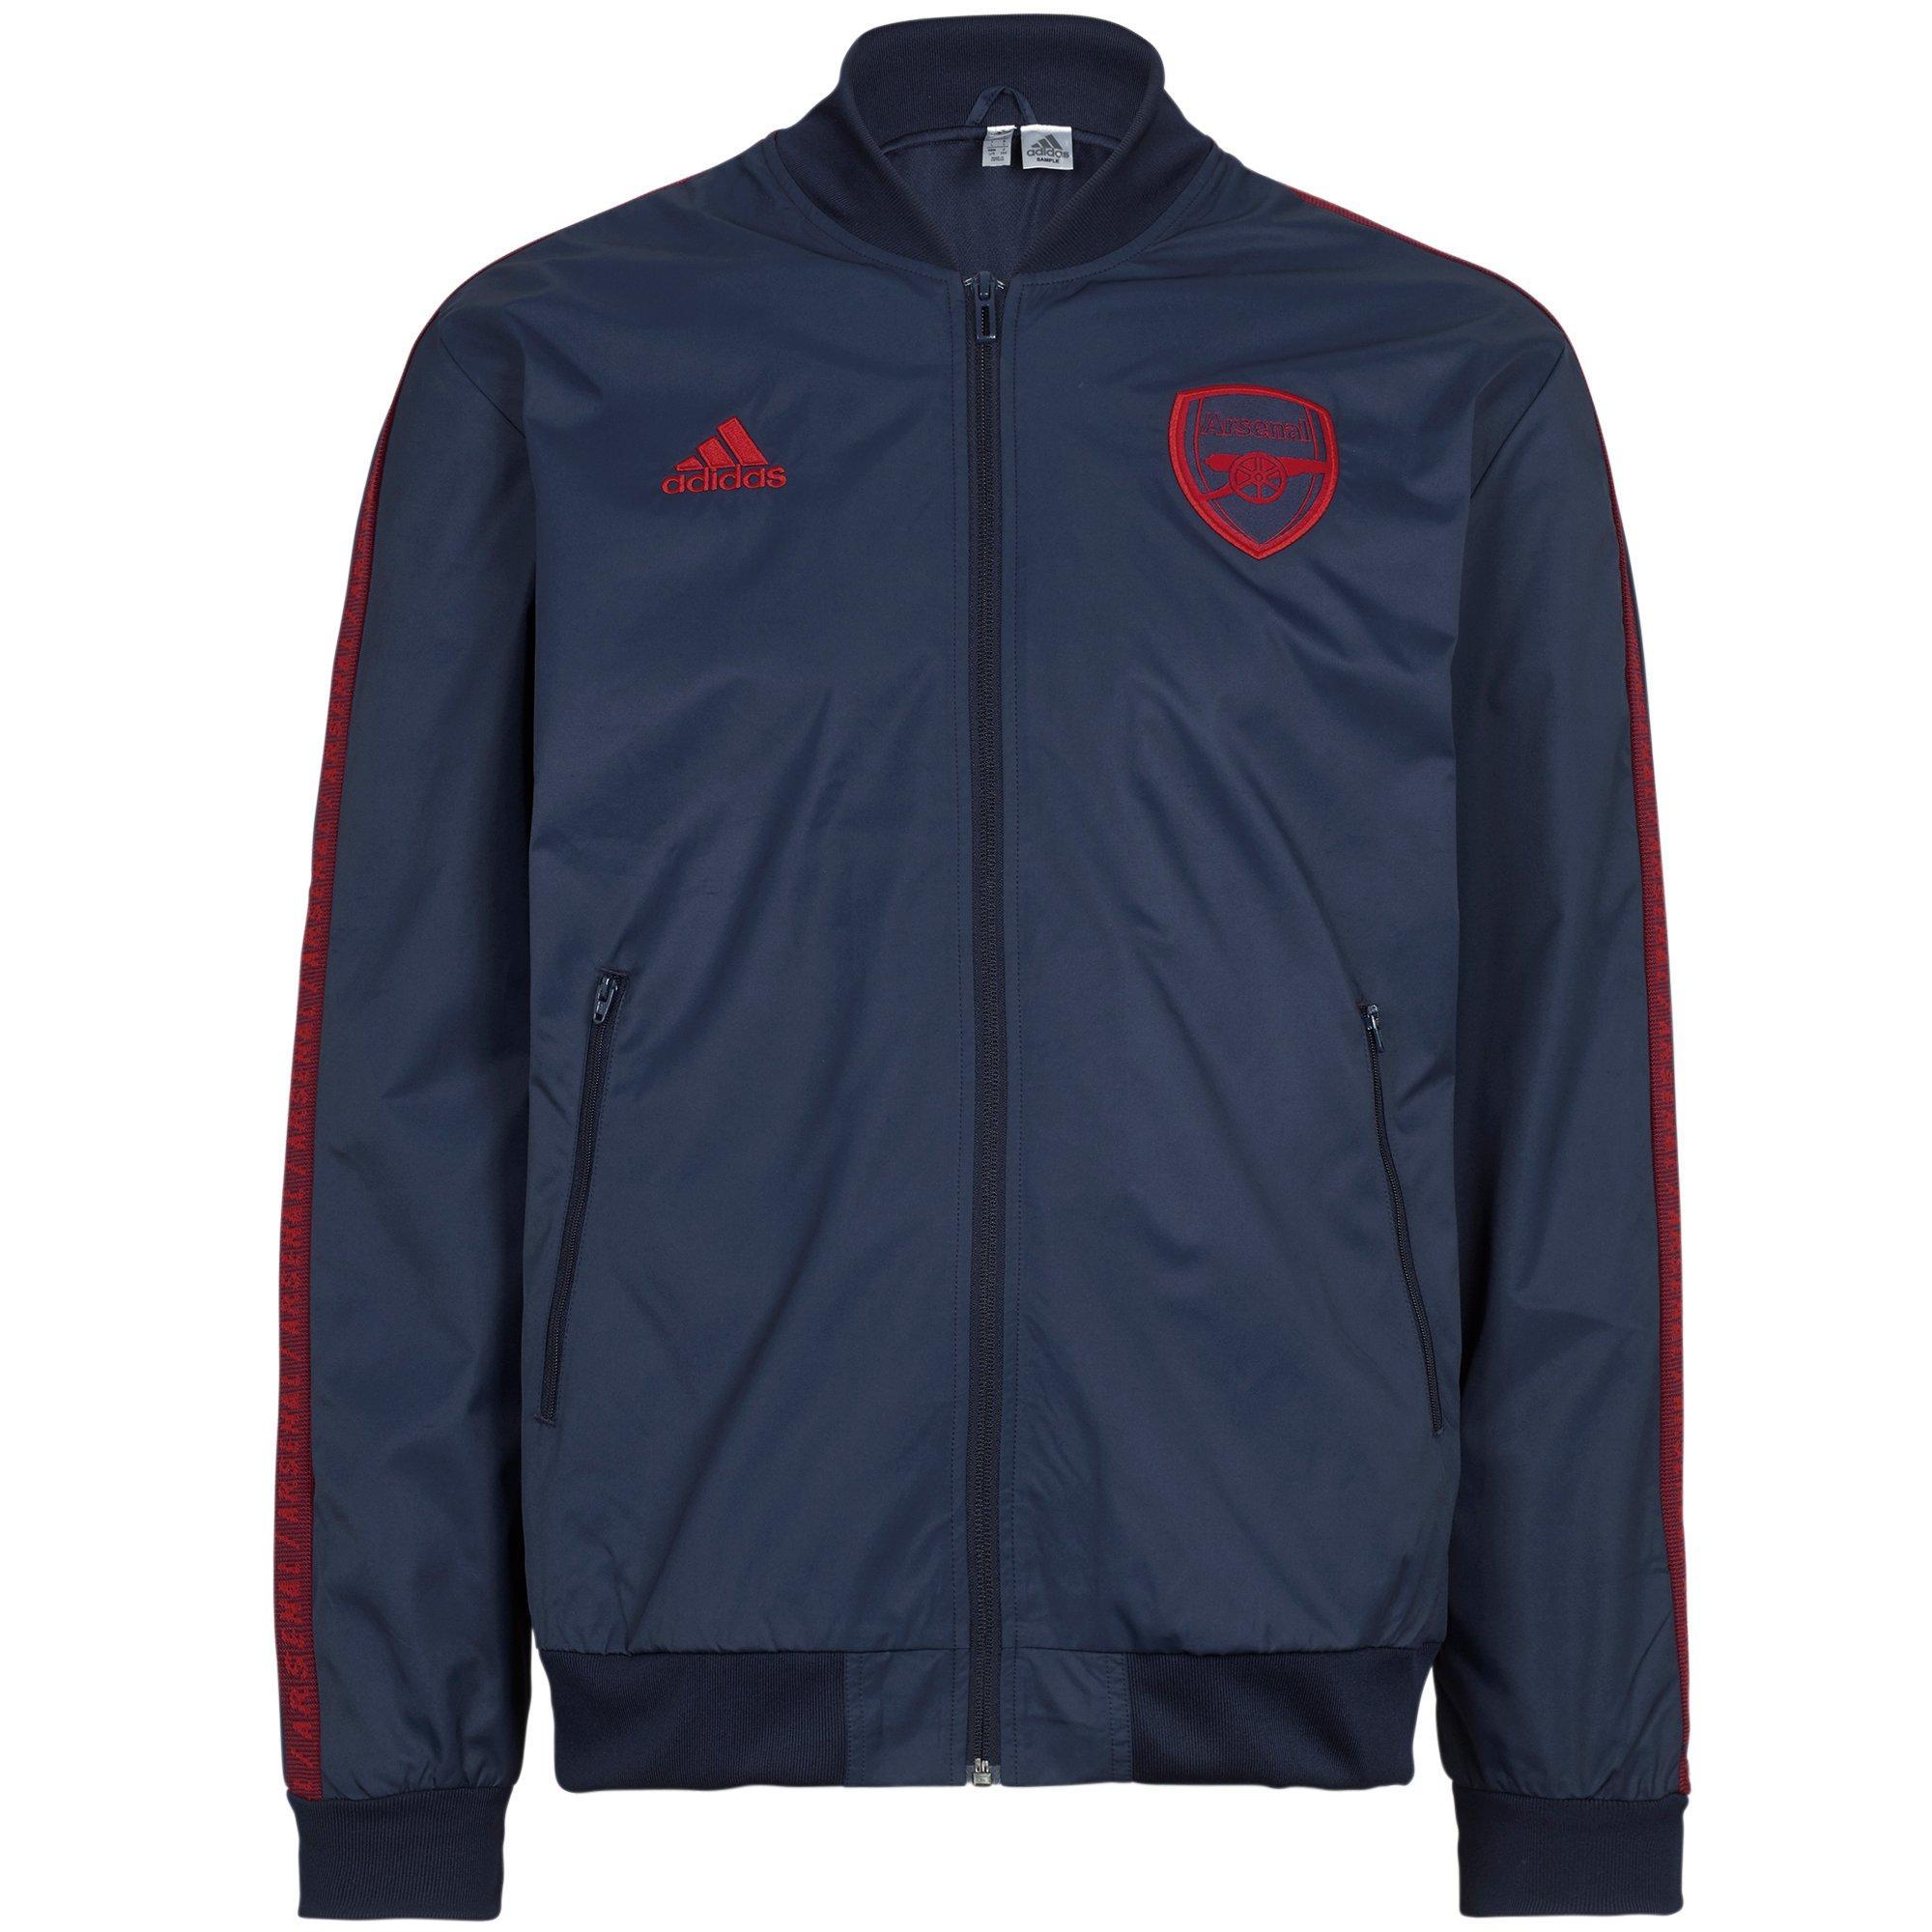 Arsenal Adult 1920 Anthem Jacket | Official Online Store